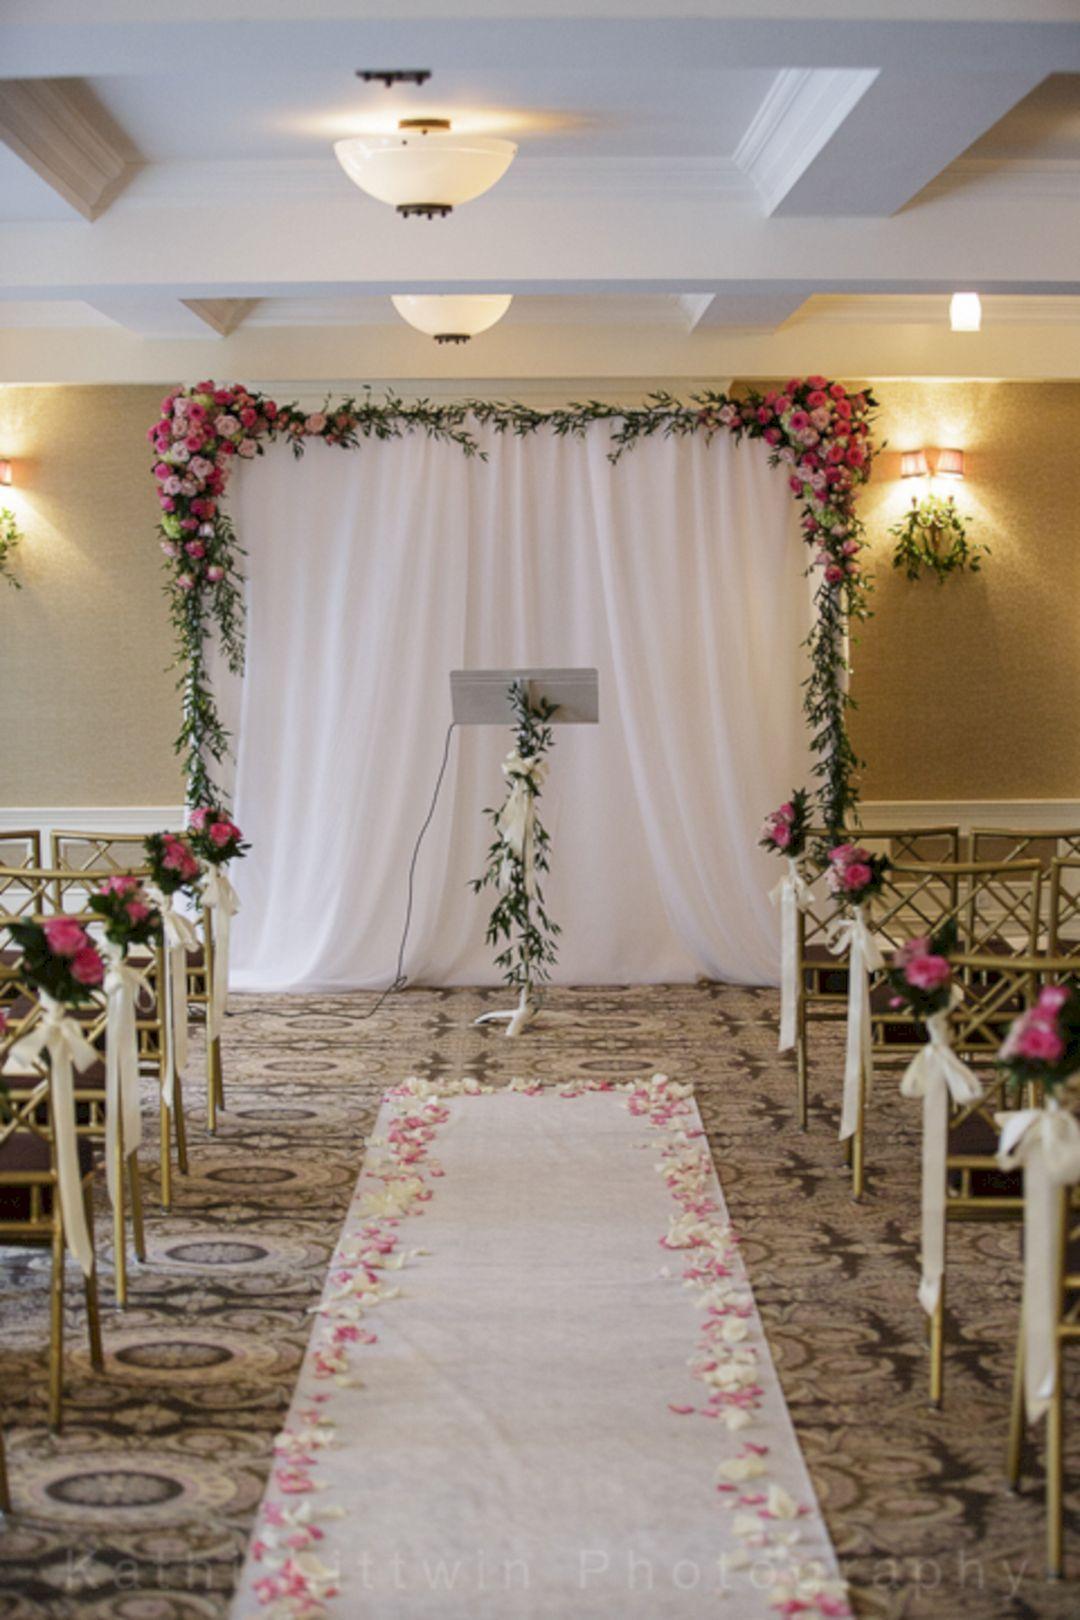 Simple Wedding Ideas.45 Easy Make Wedding Backdrop Ideas That You Can Make It Self